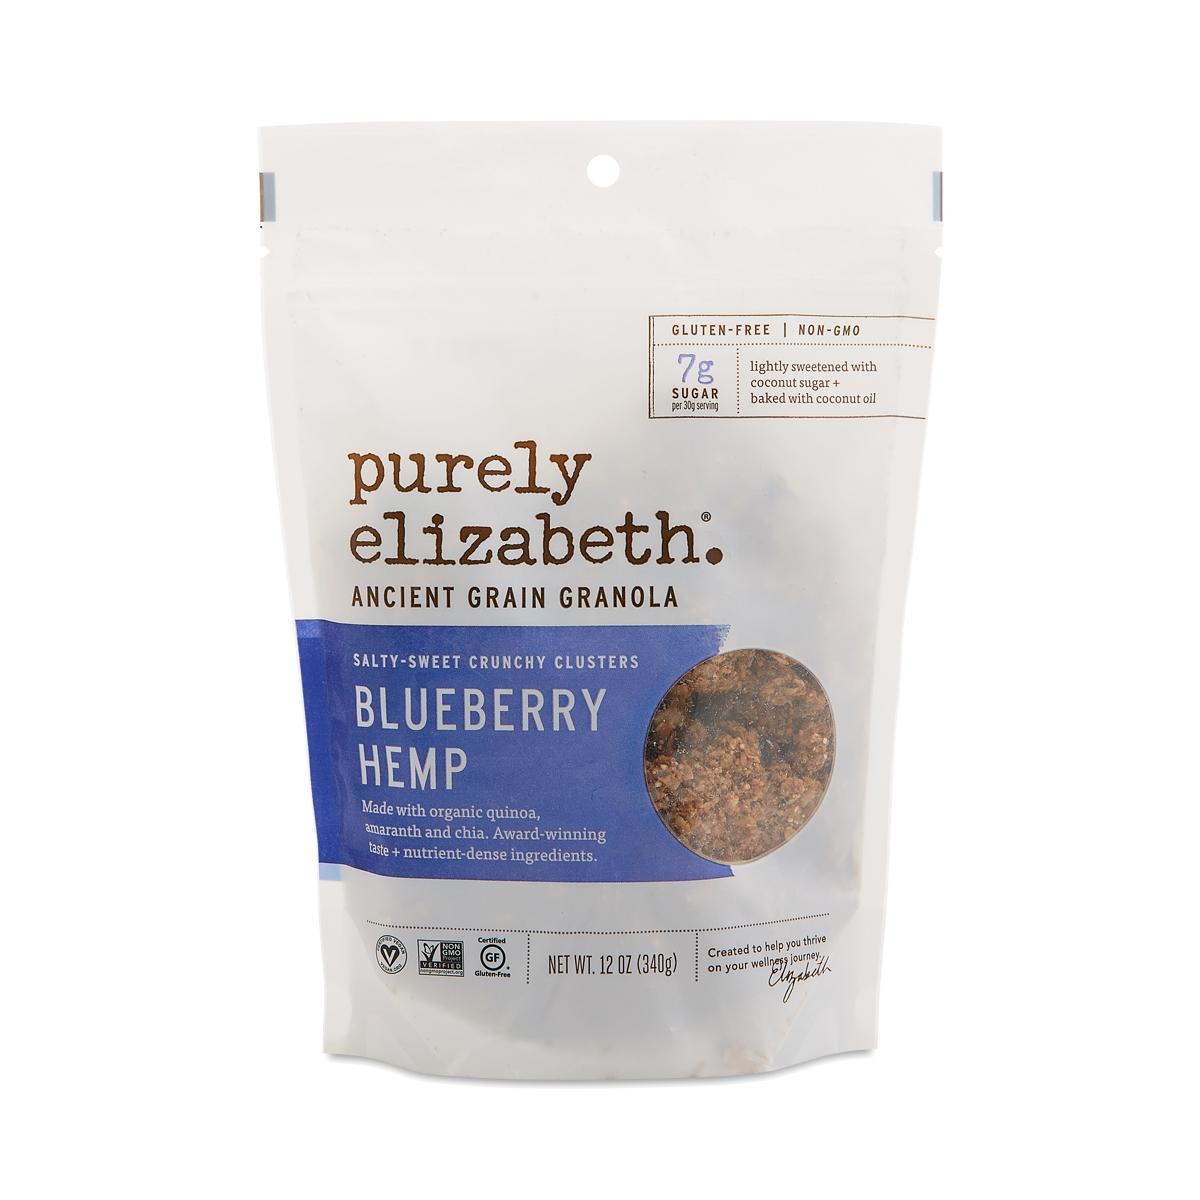 Purely Elizabeth Ancient Grain Granola Cereal, Blueberry Hemp 12 oz bag